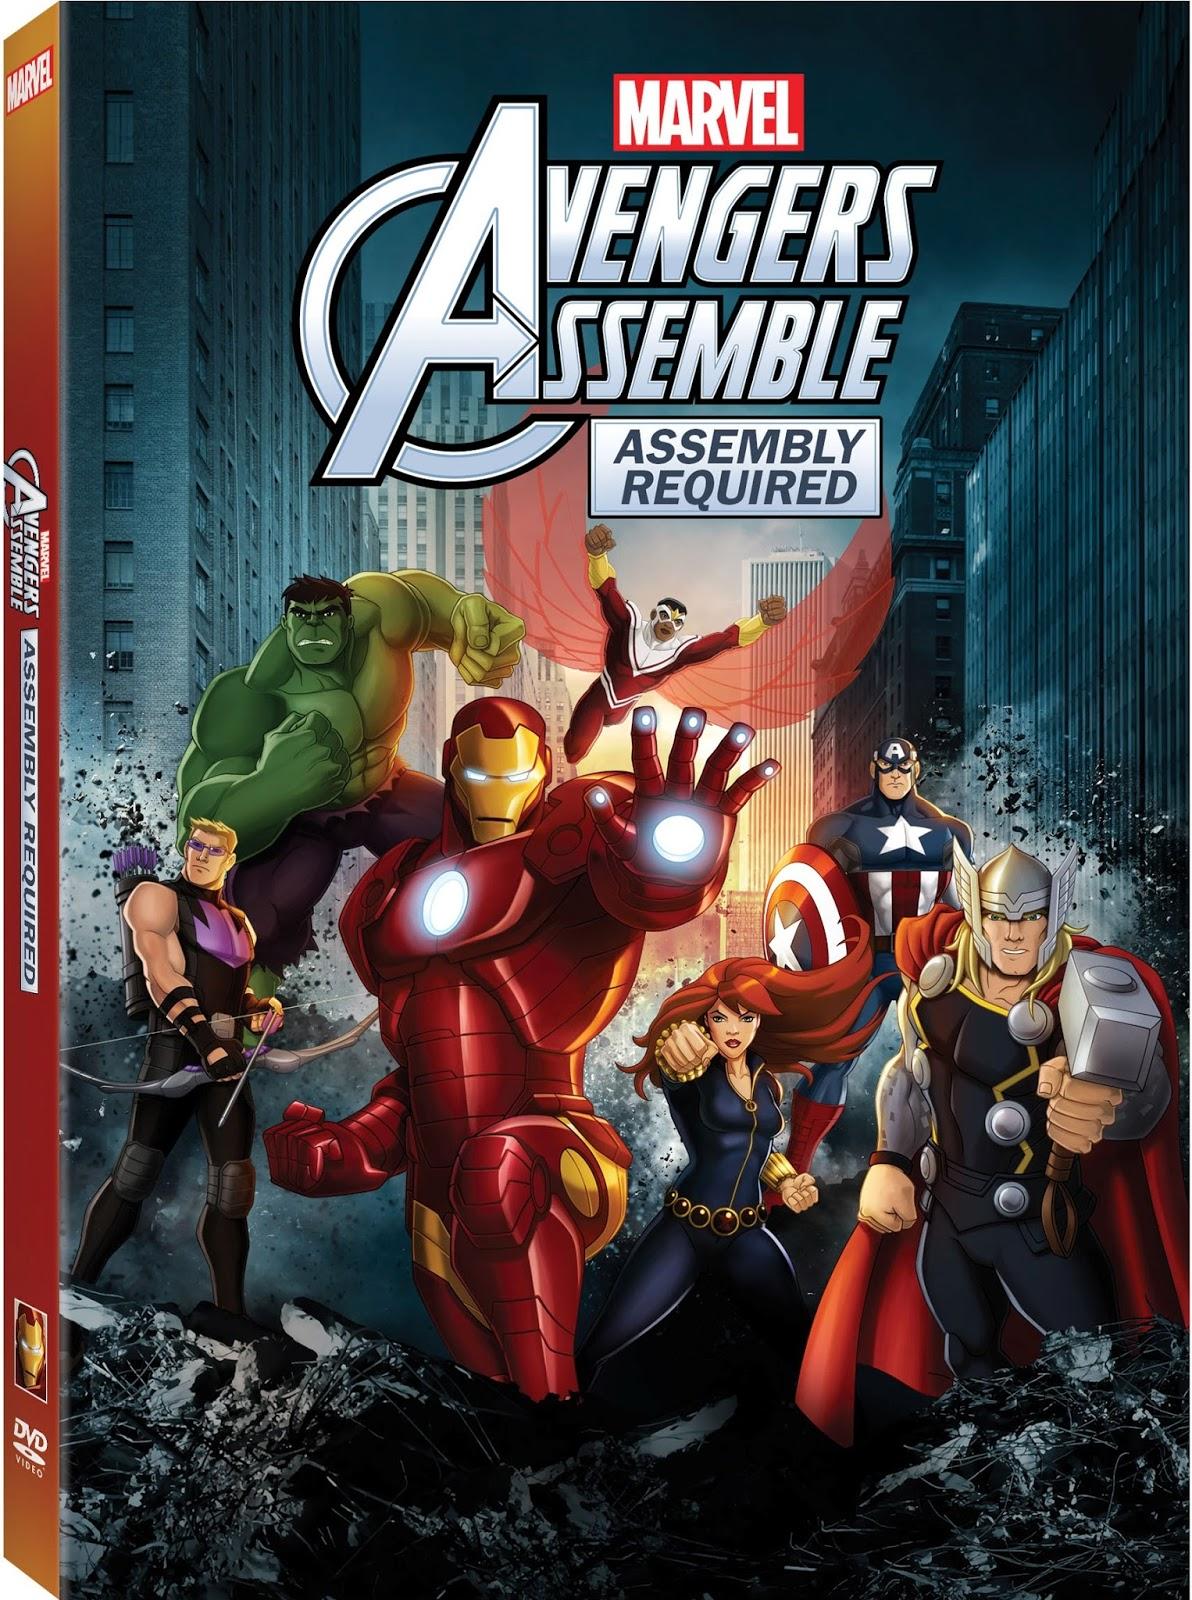 Iron man anime capitulo 12 latino dating 4